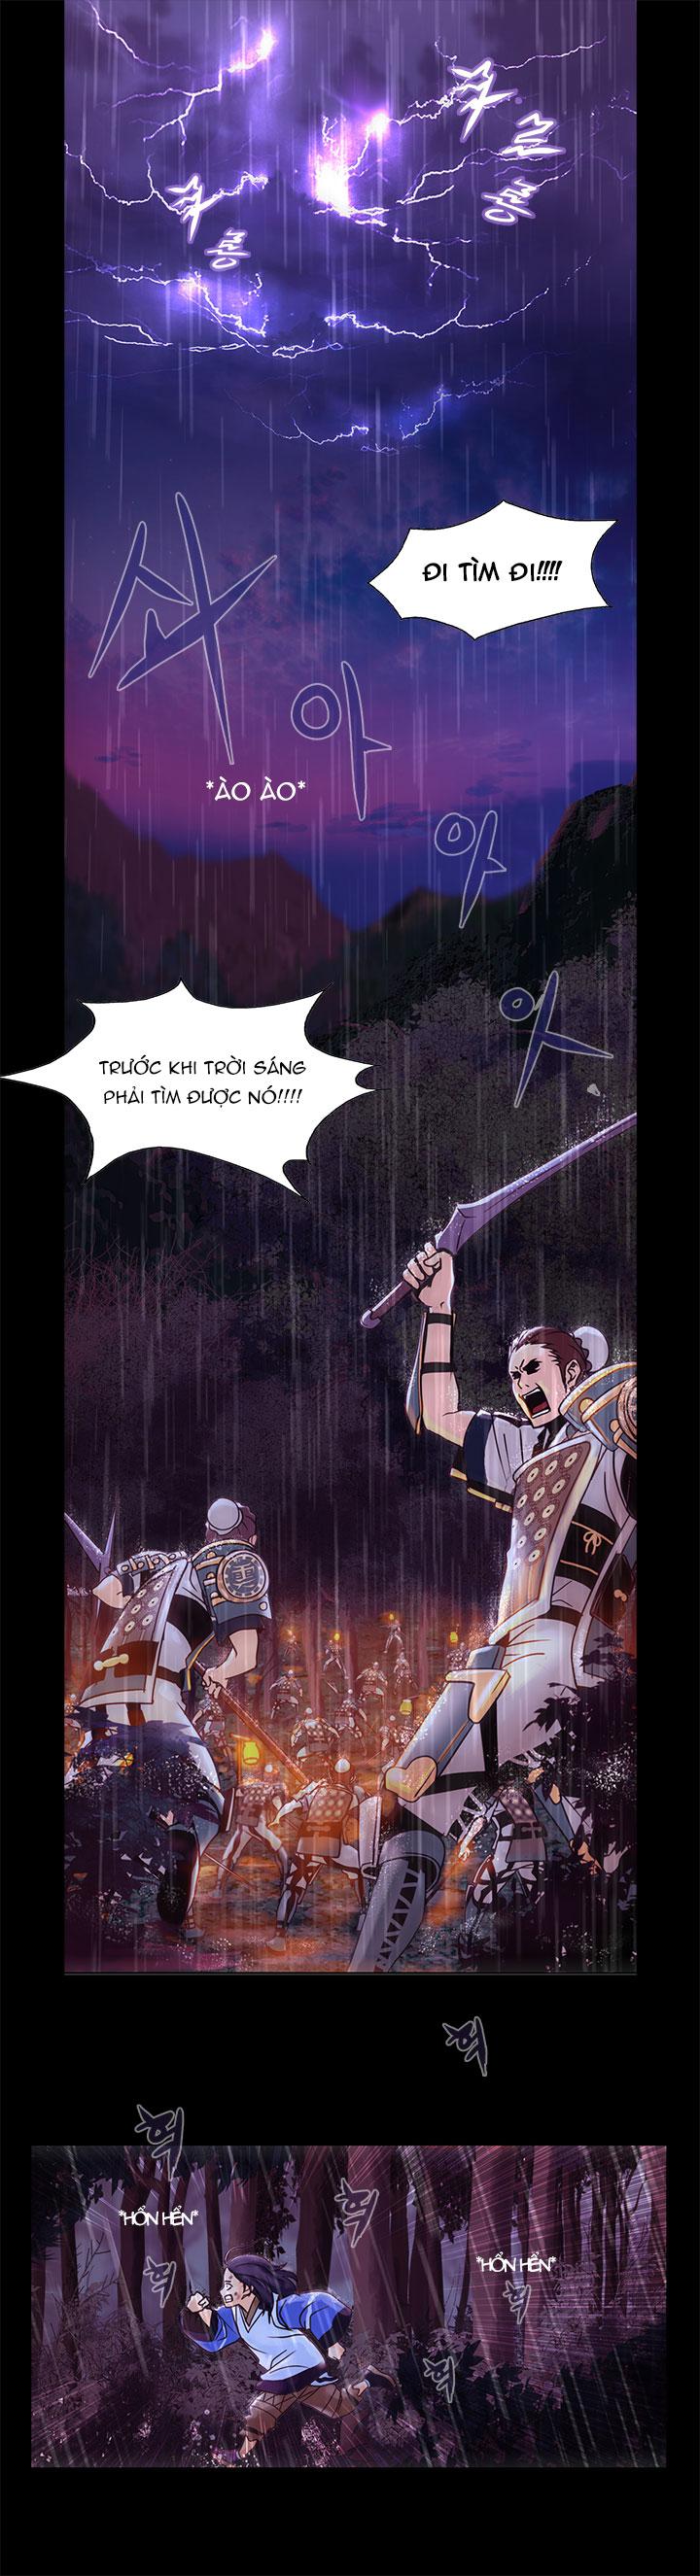 Blade & Soul comic